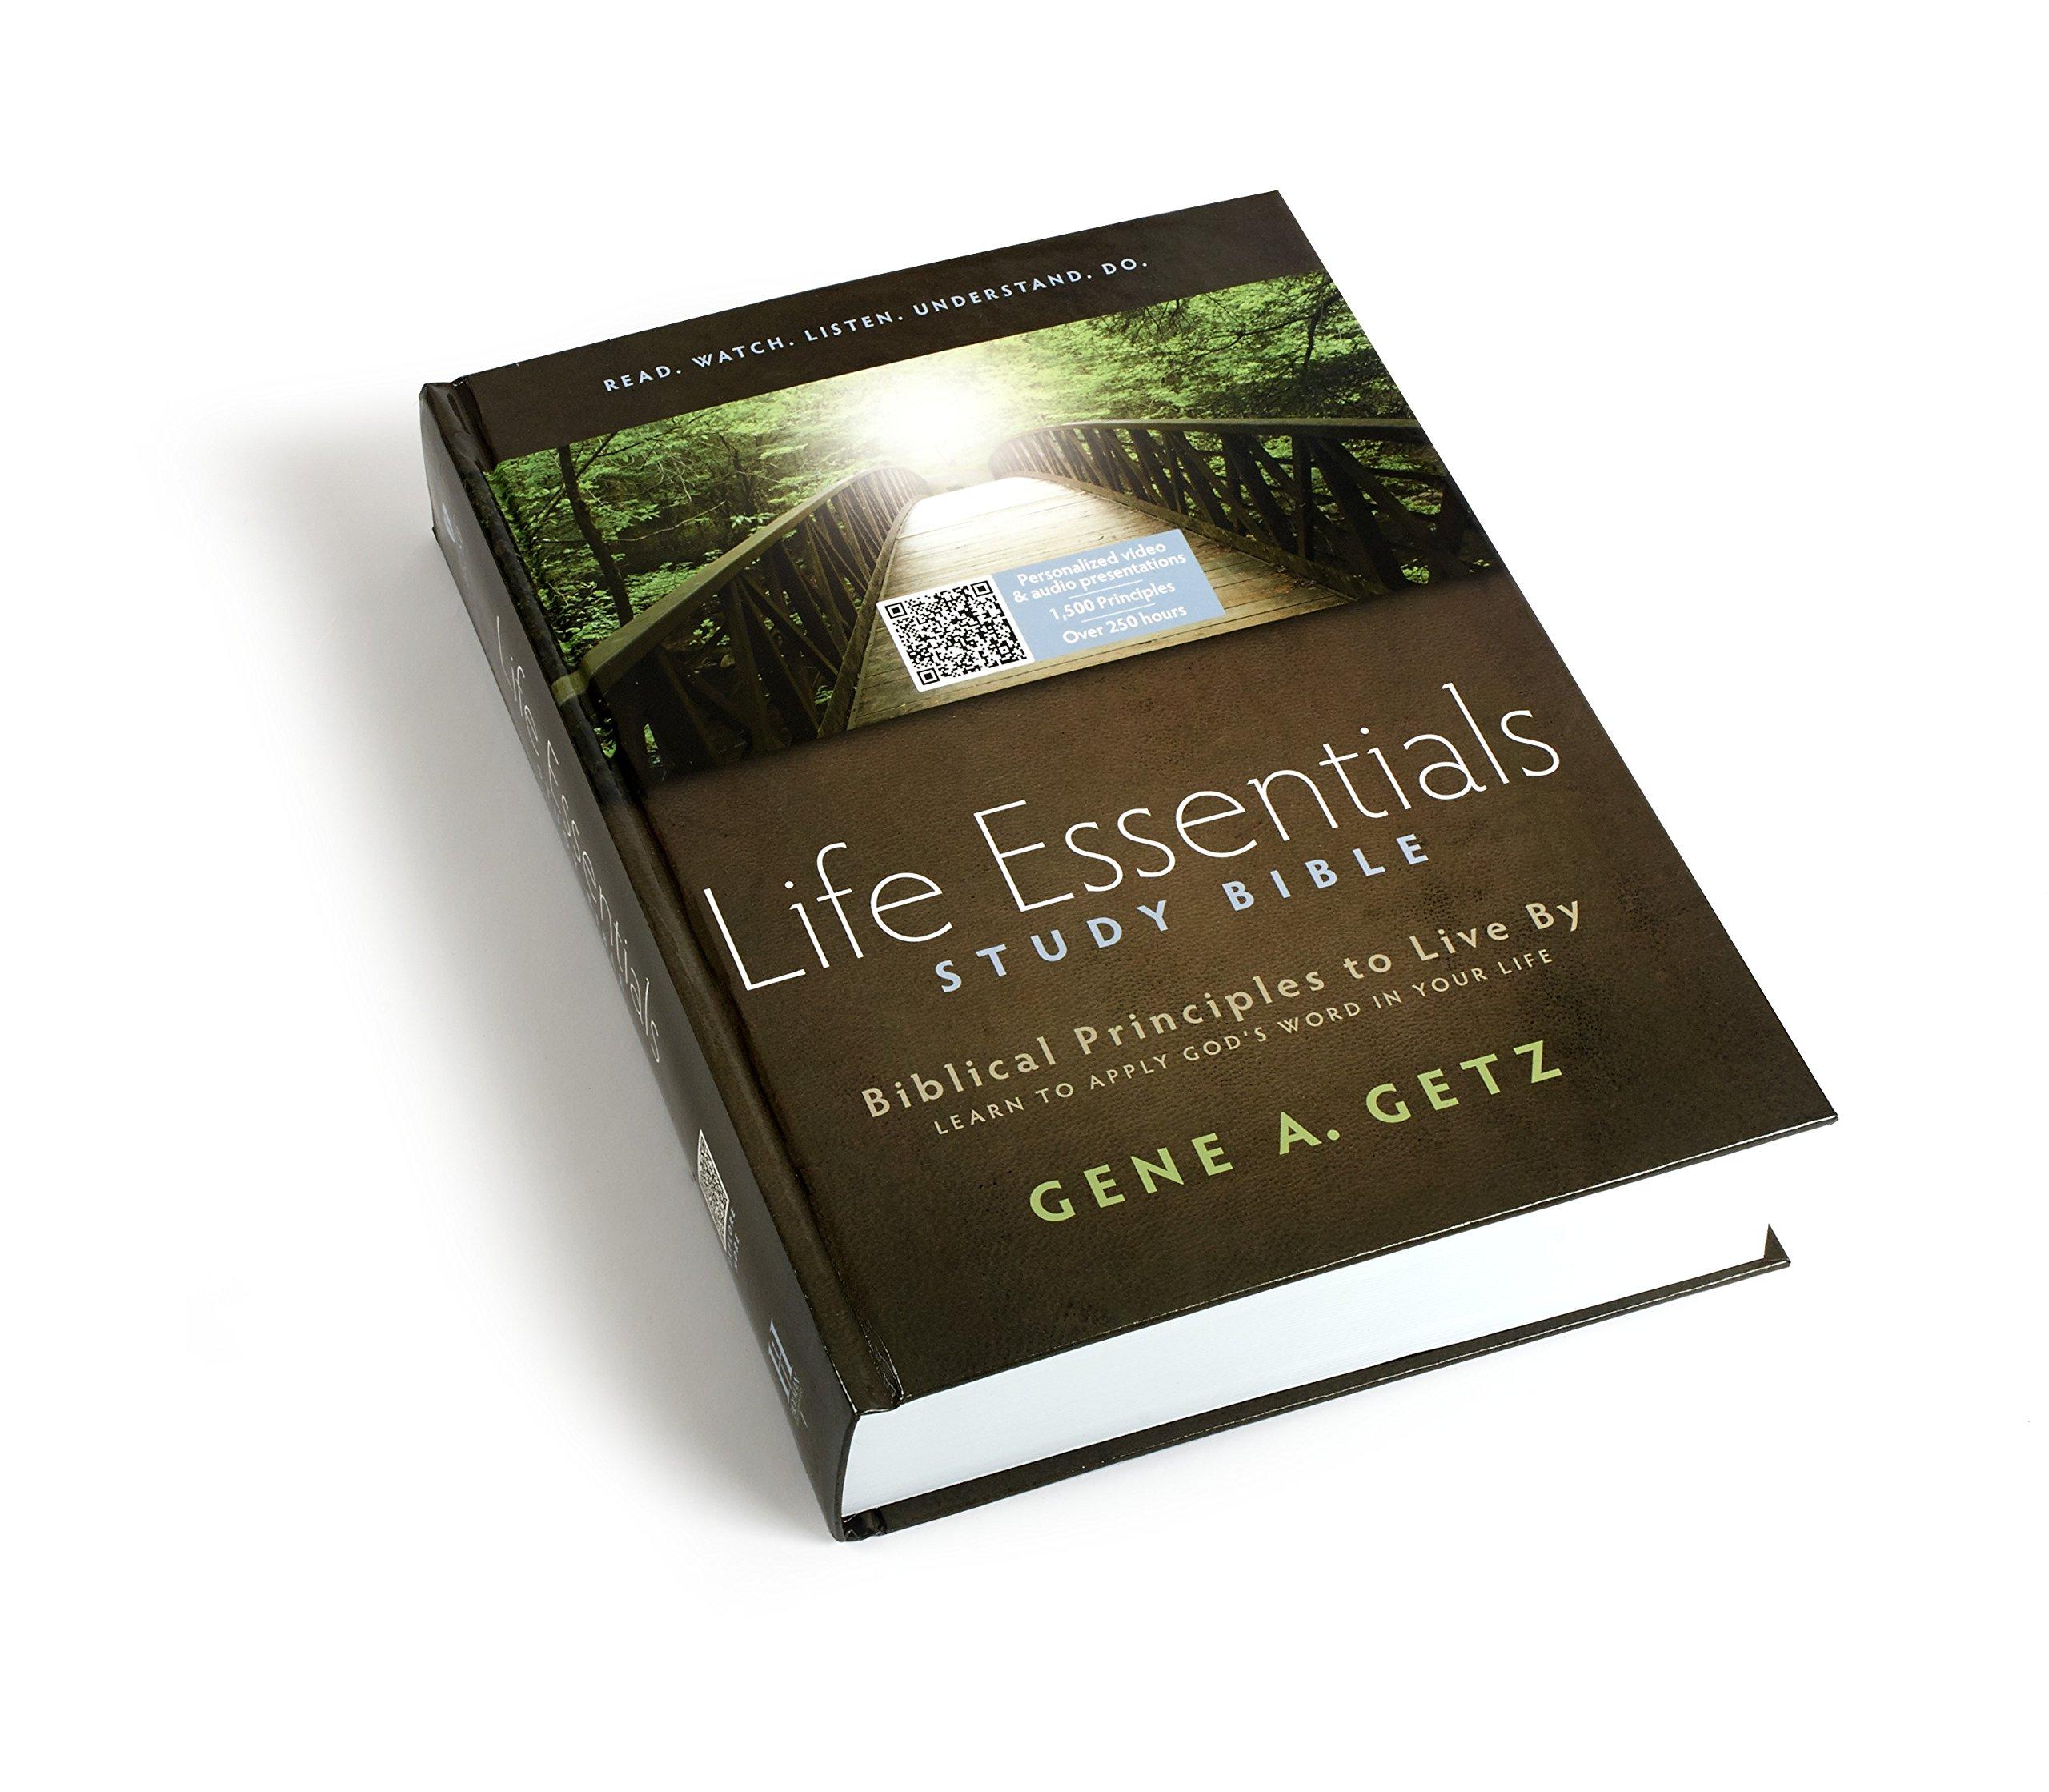 Life Essentials Study Bible-HCSB: Principles to Live by: Amazon.es: Holman Bible Staff, Gene A. Getz: Libros en idiomas extranjeros